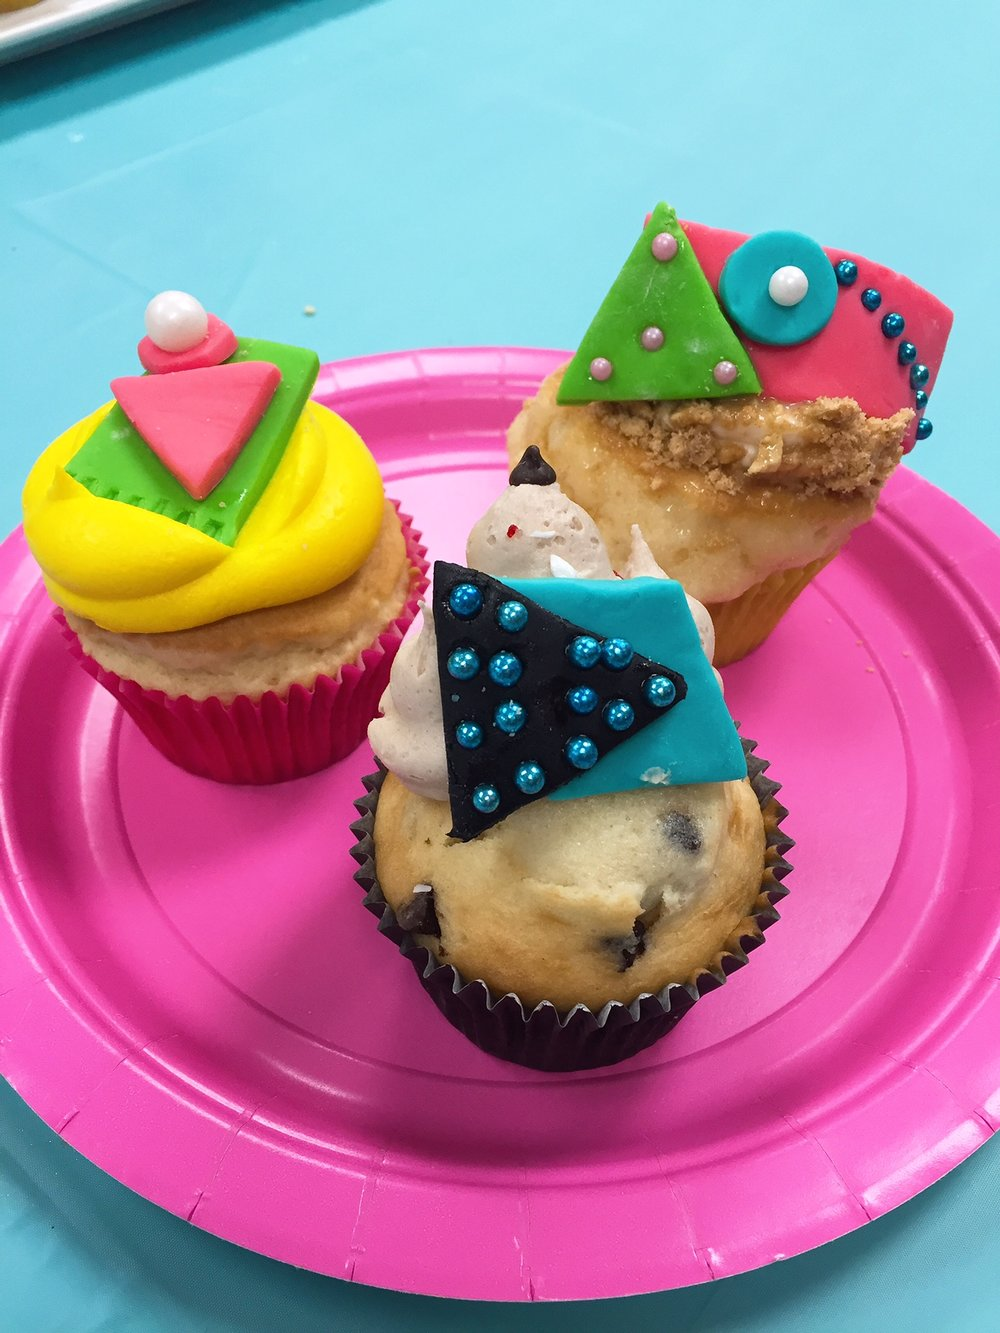 The Winning Cupcakes